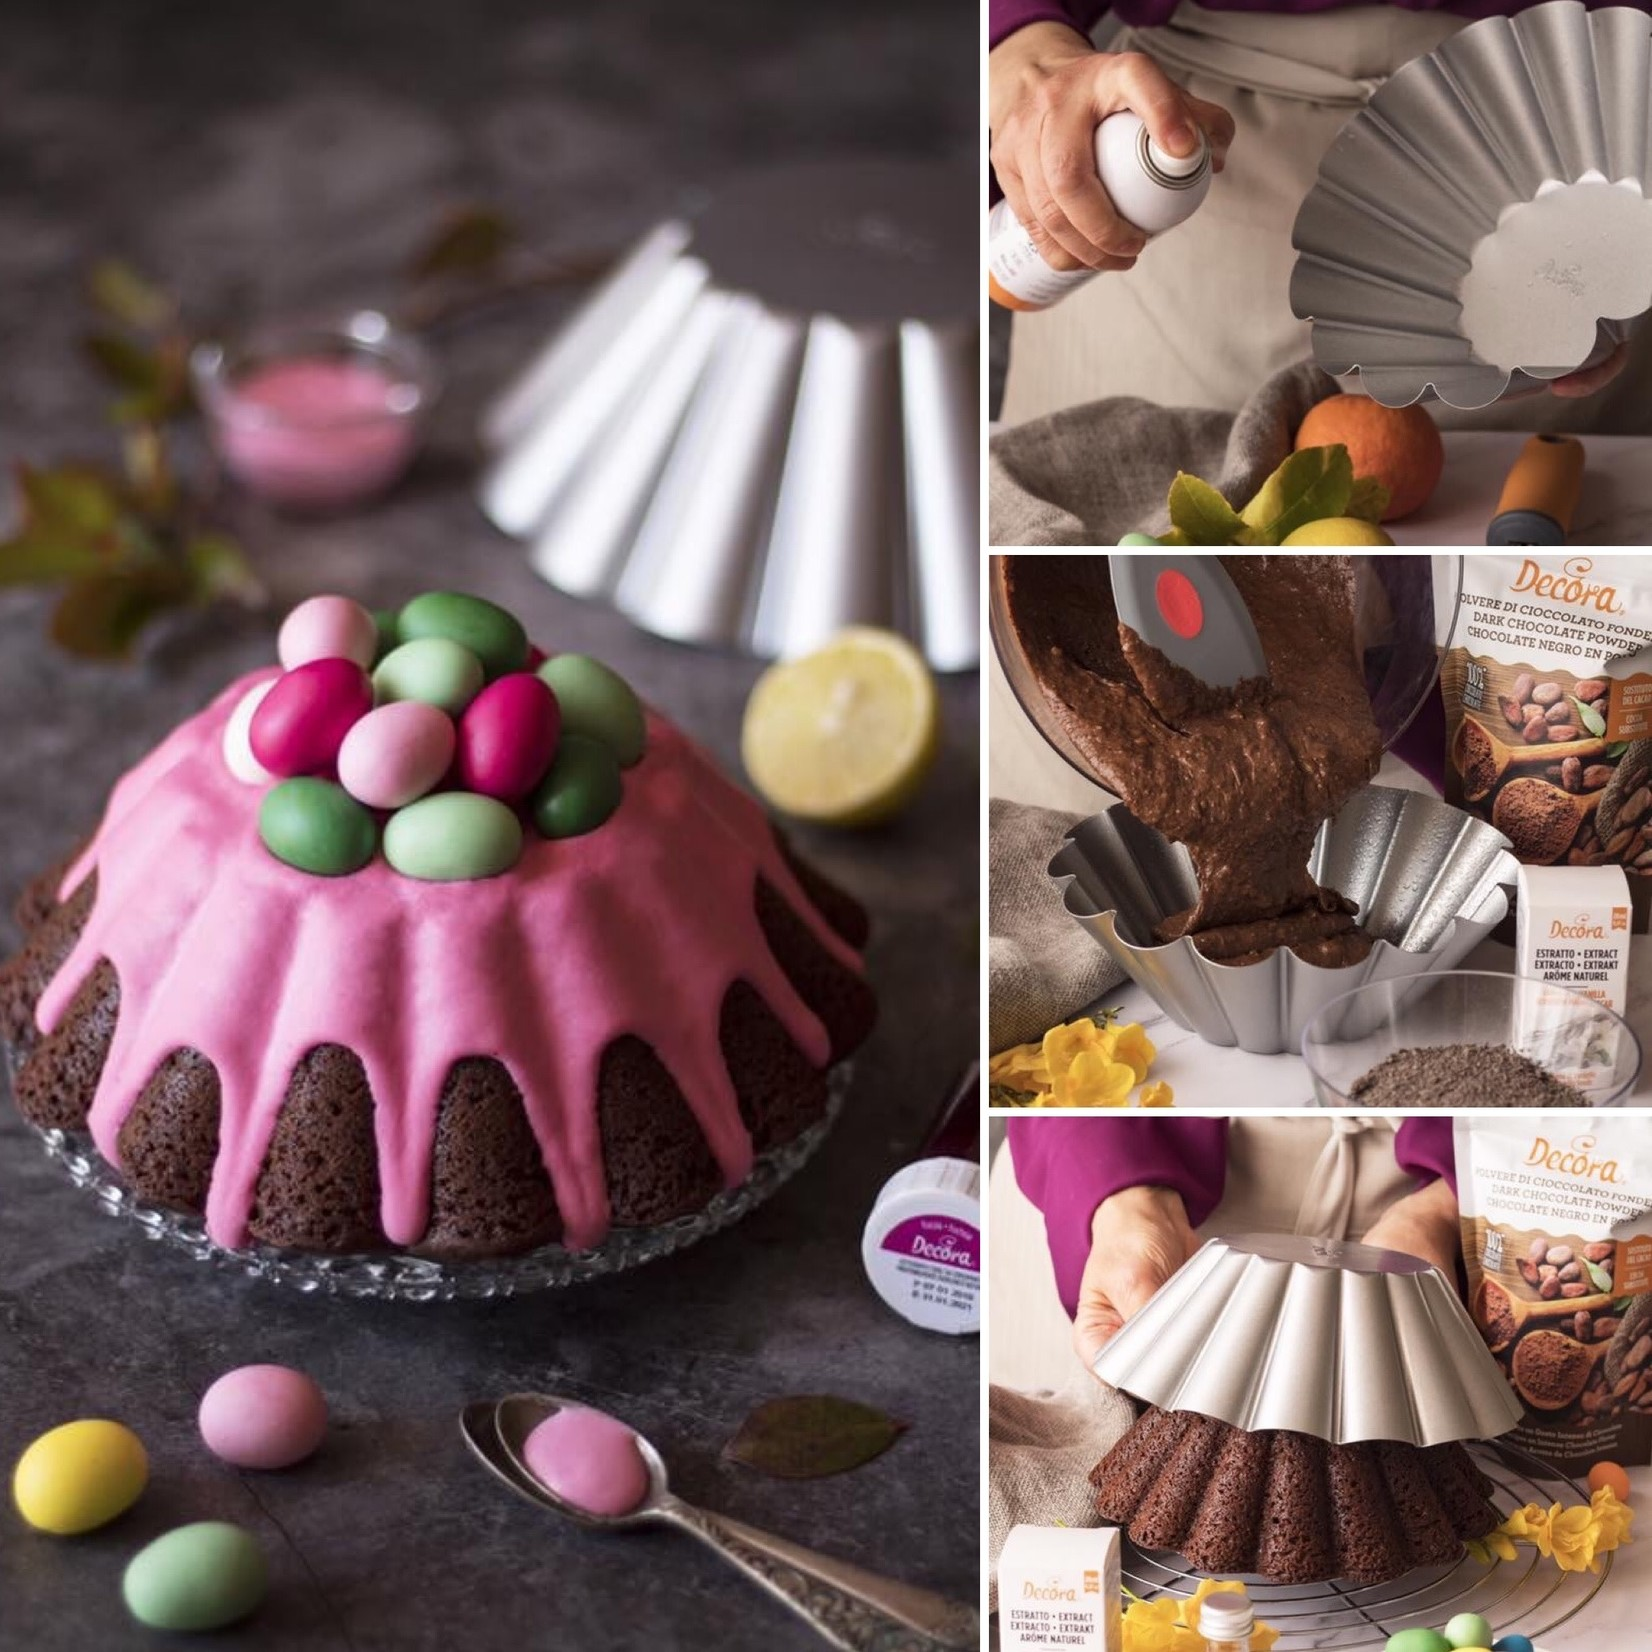 Decora Brioche/puddingvorm met antikleeflaag 24cm